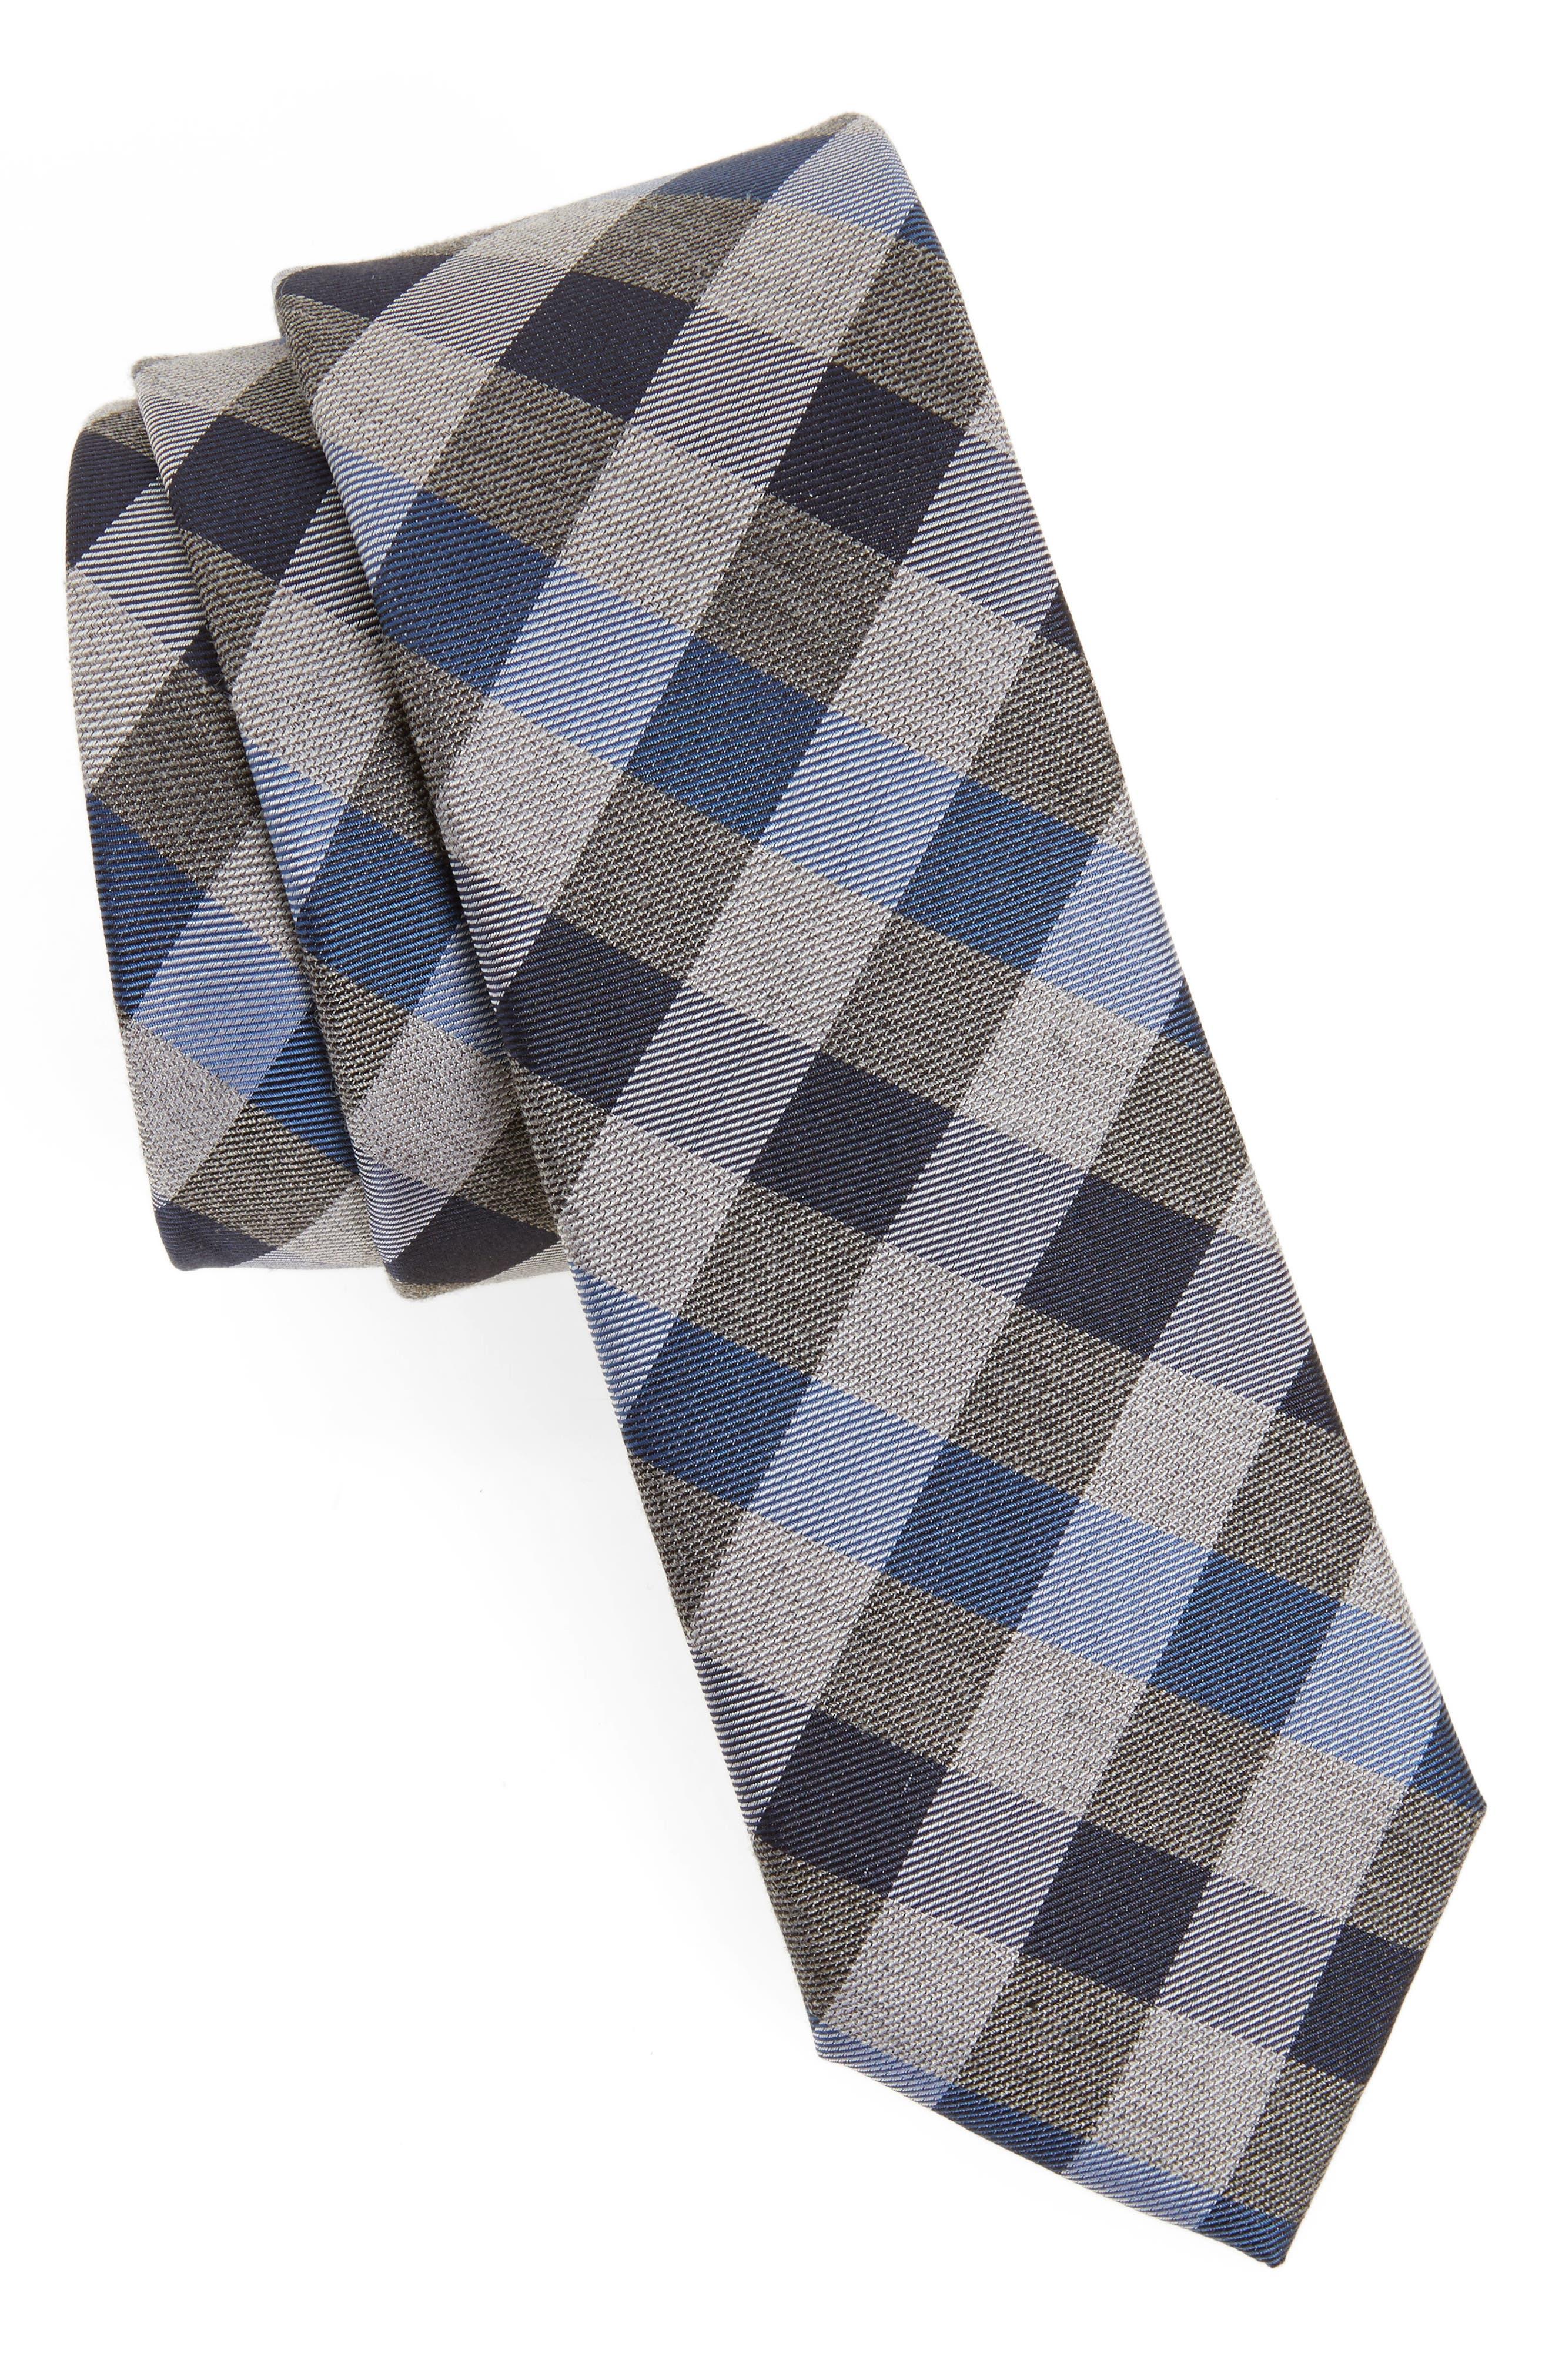 Main Image - Calibrate Schoolboy Gingham Check Silk Tie